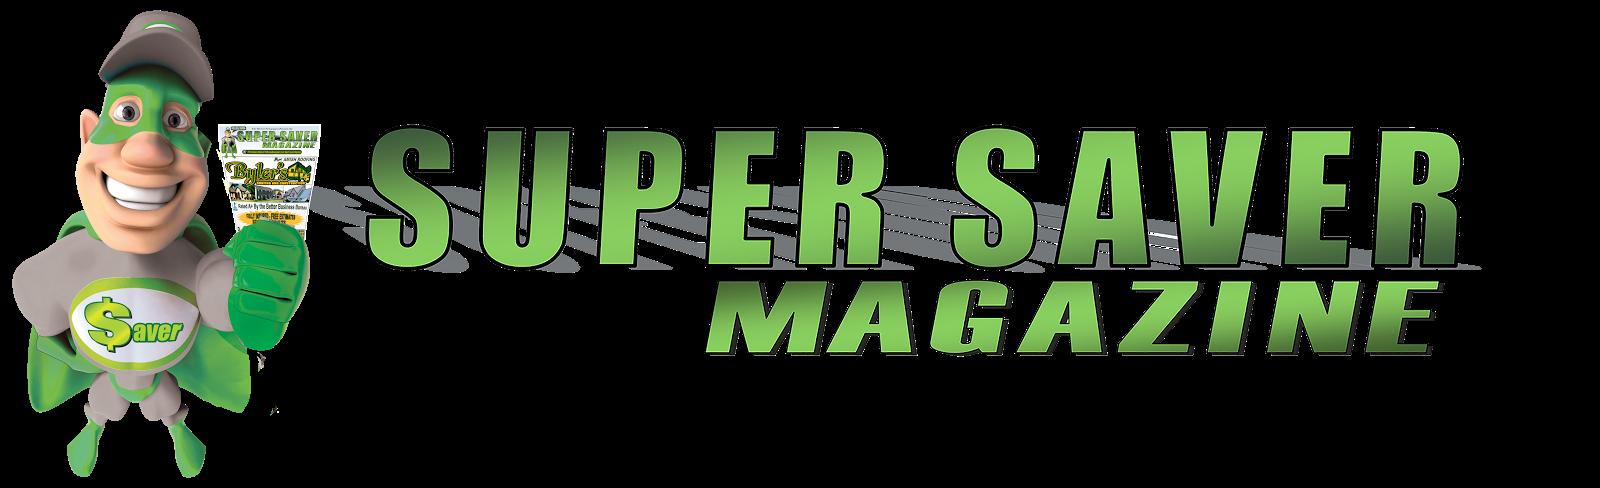 Super Saver Magazine